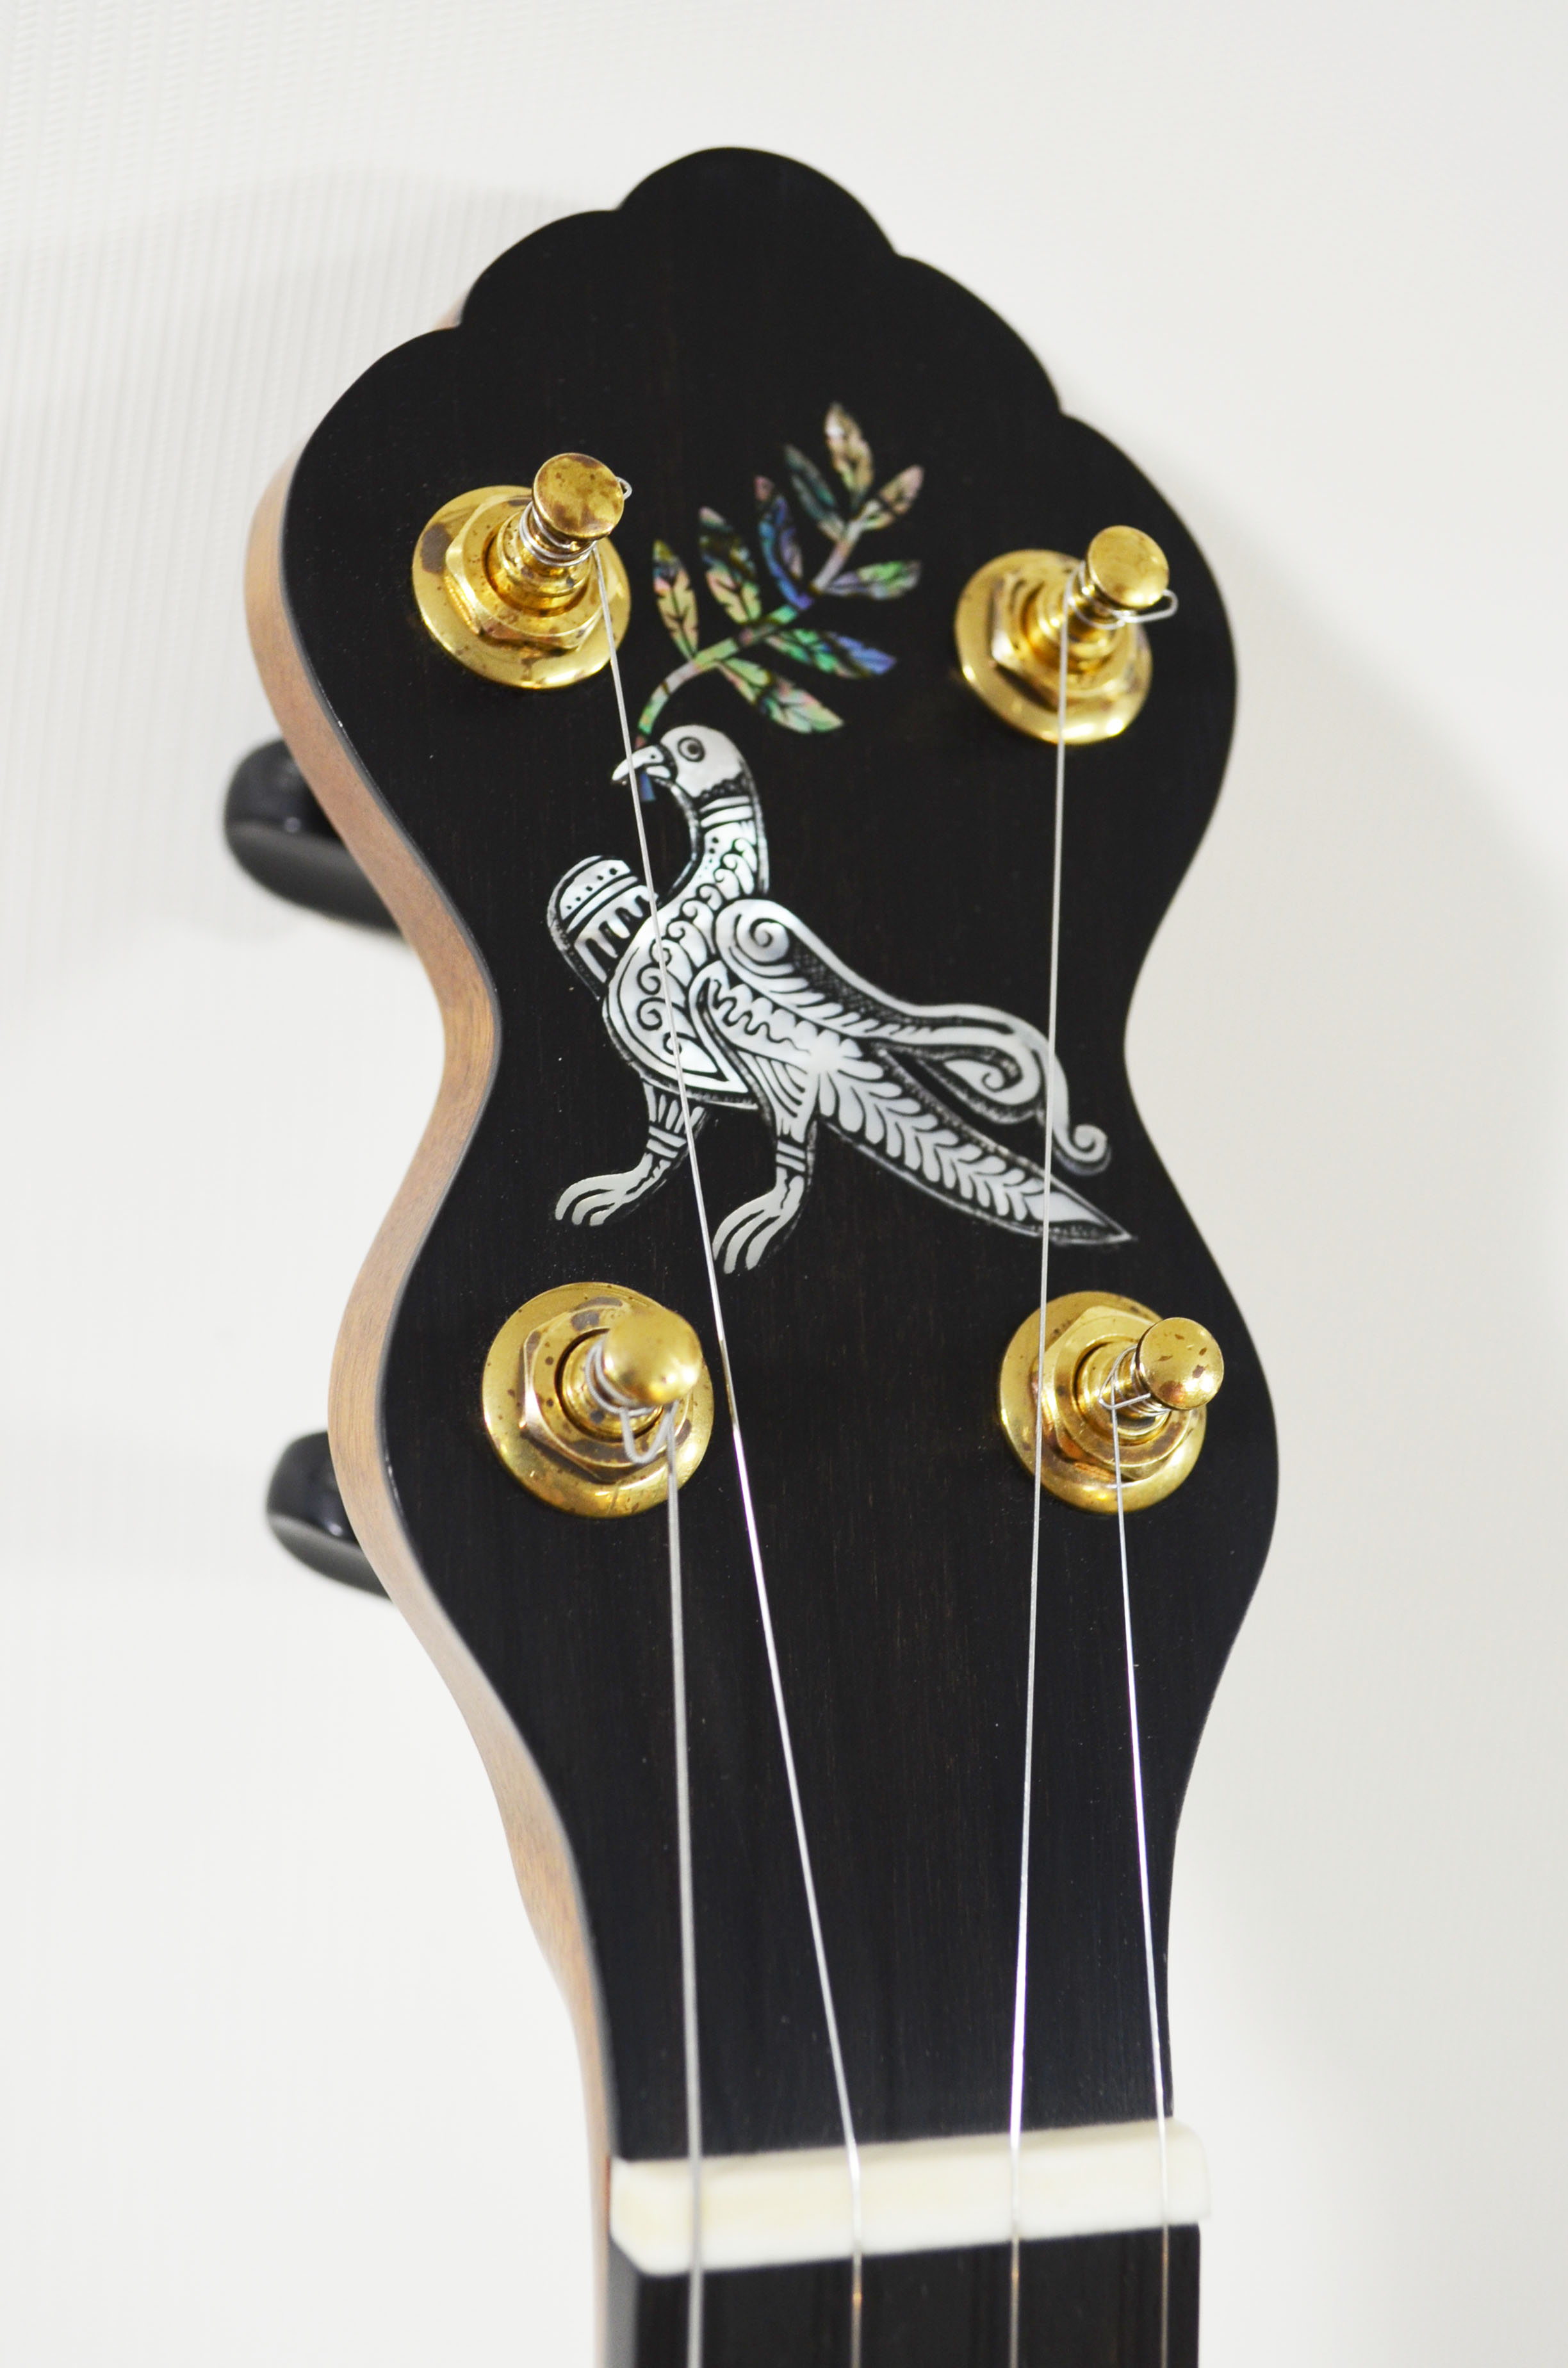 Russian folk art-inspired dove